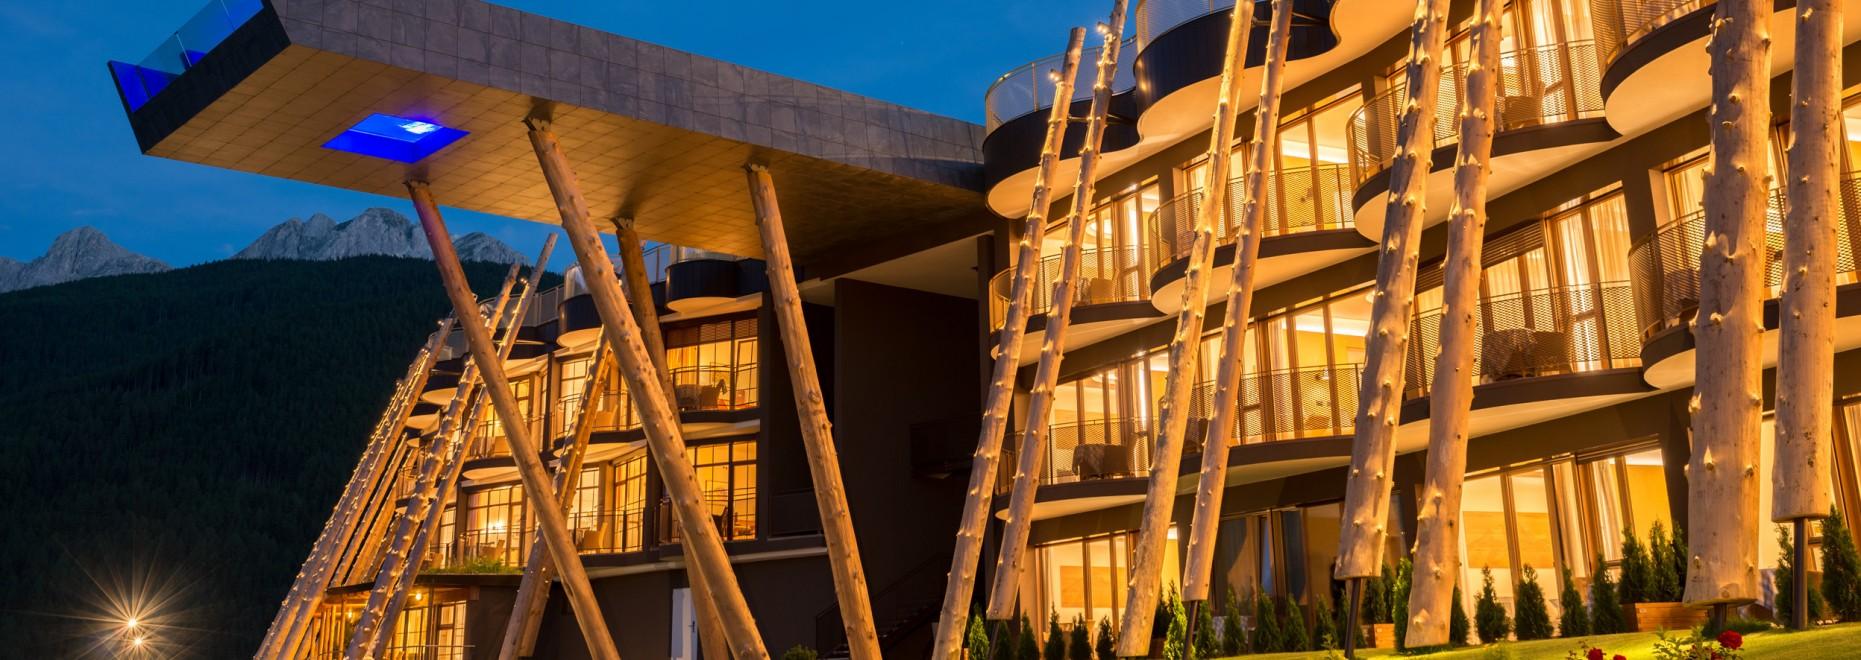 alpin_panorama_hotel_hubertus_aussenansicht_daemmerung_131